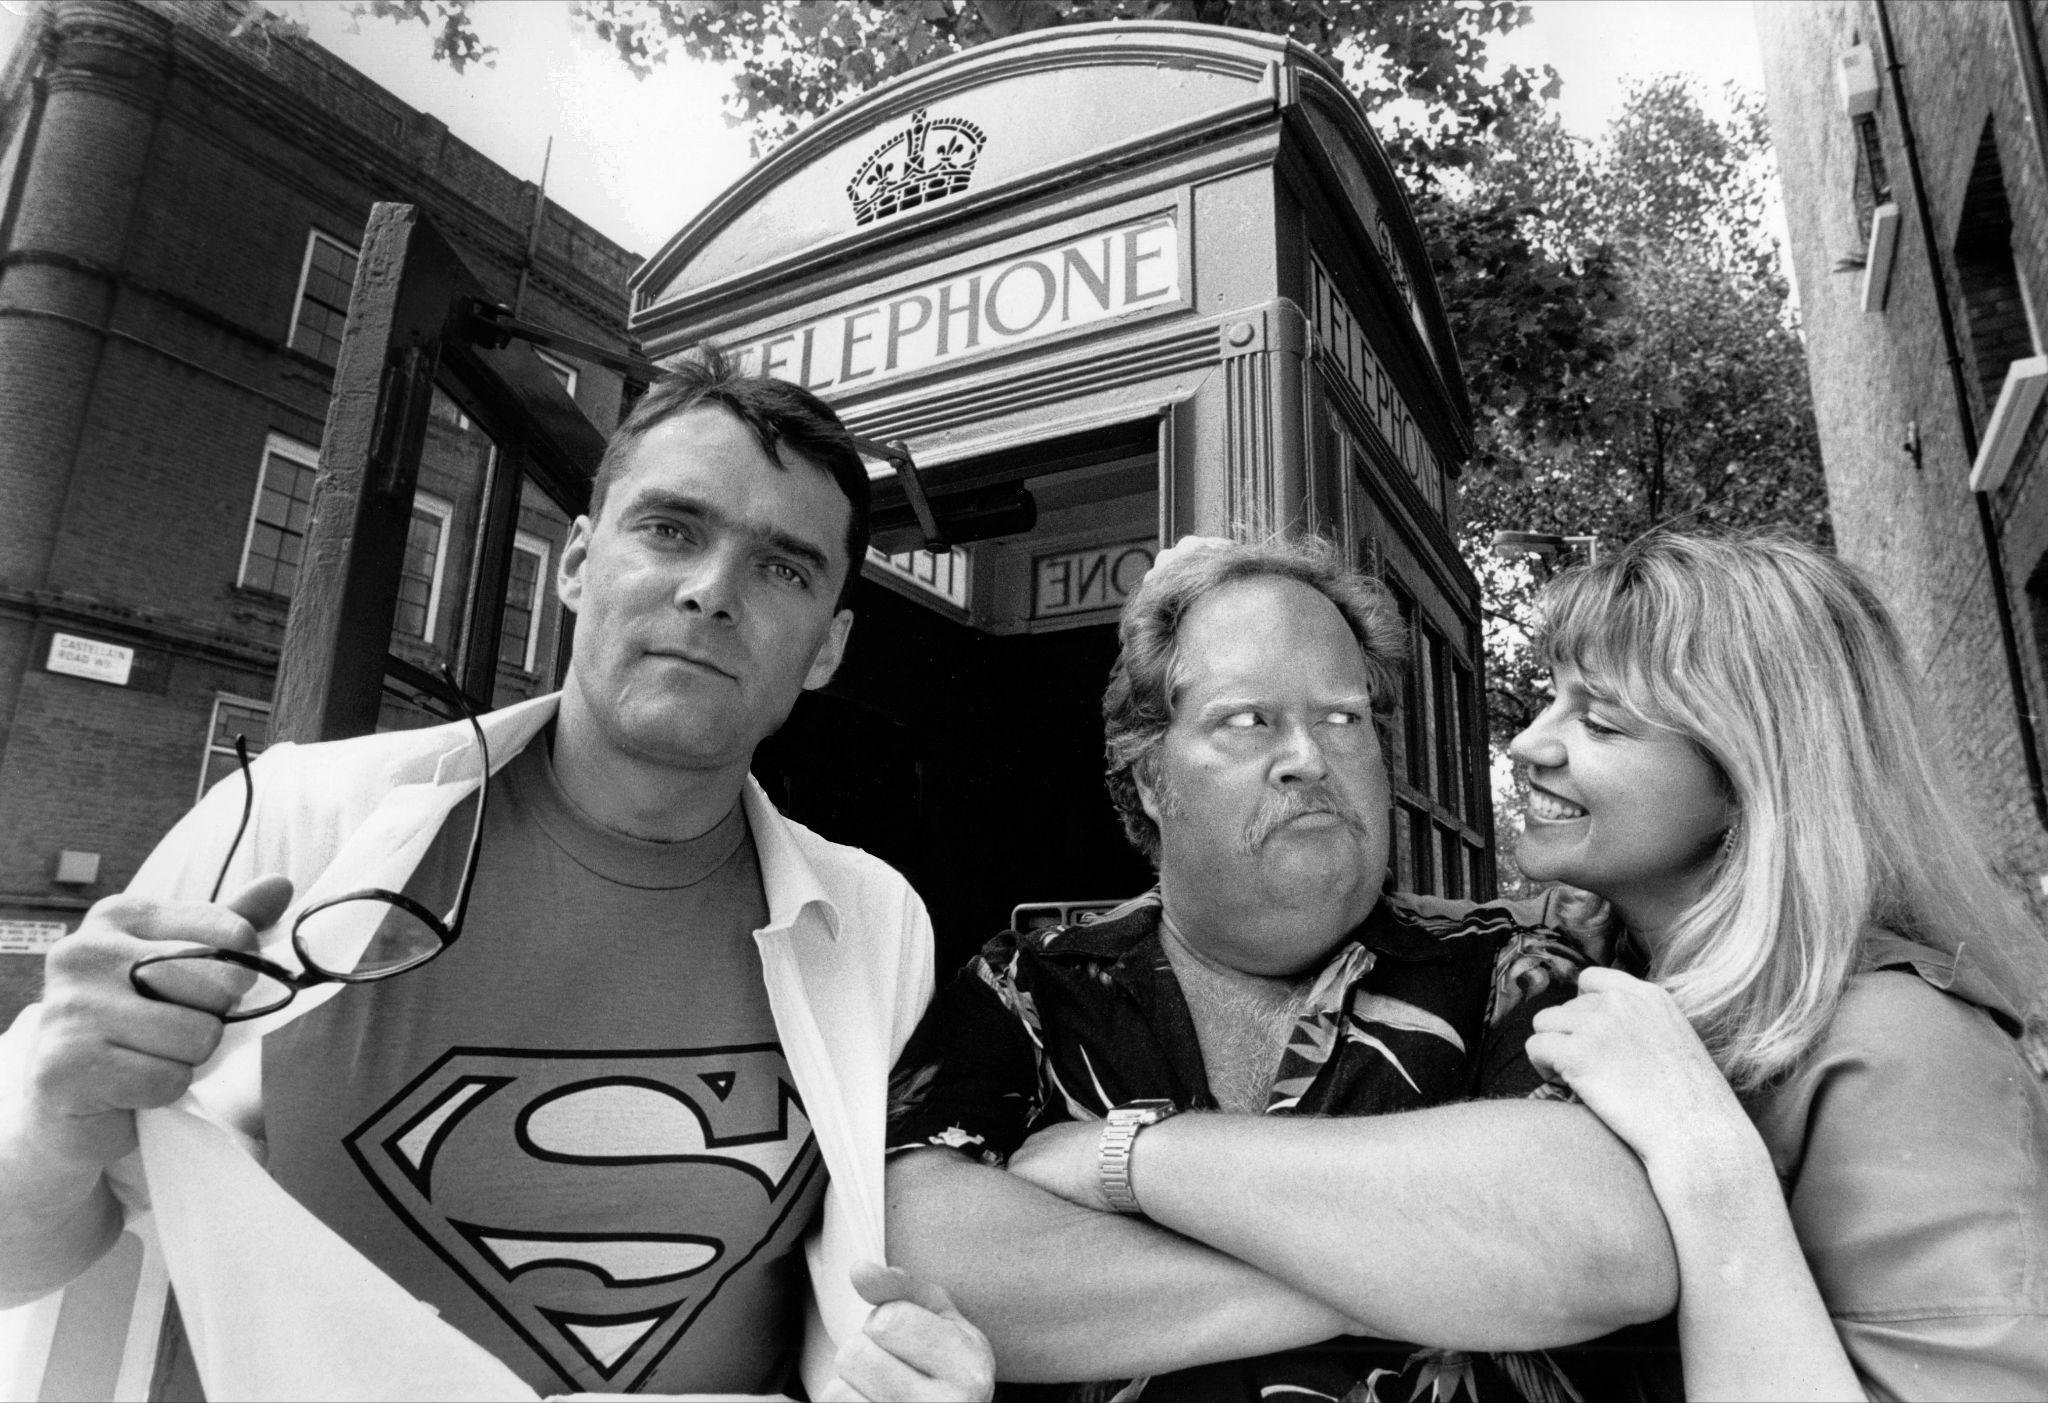 Stuart Milligan (clark kent/superman), william hootkins (lex luthor) and lorelei king (lois Lane)